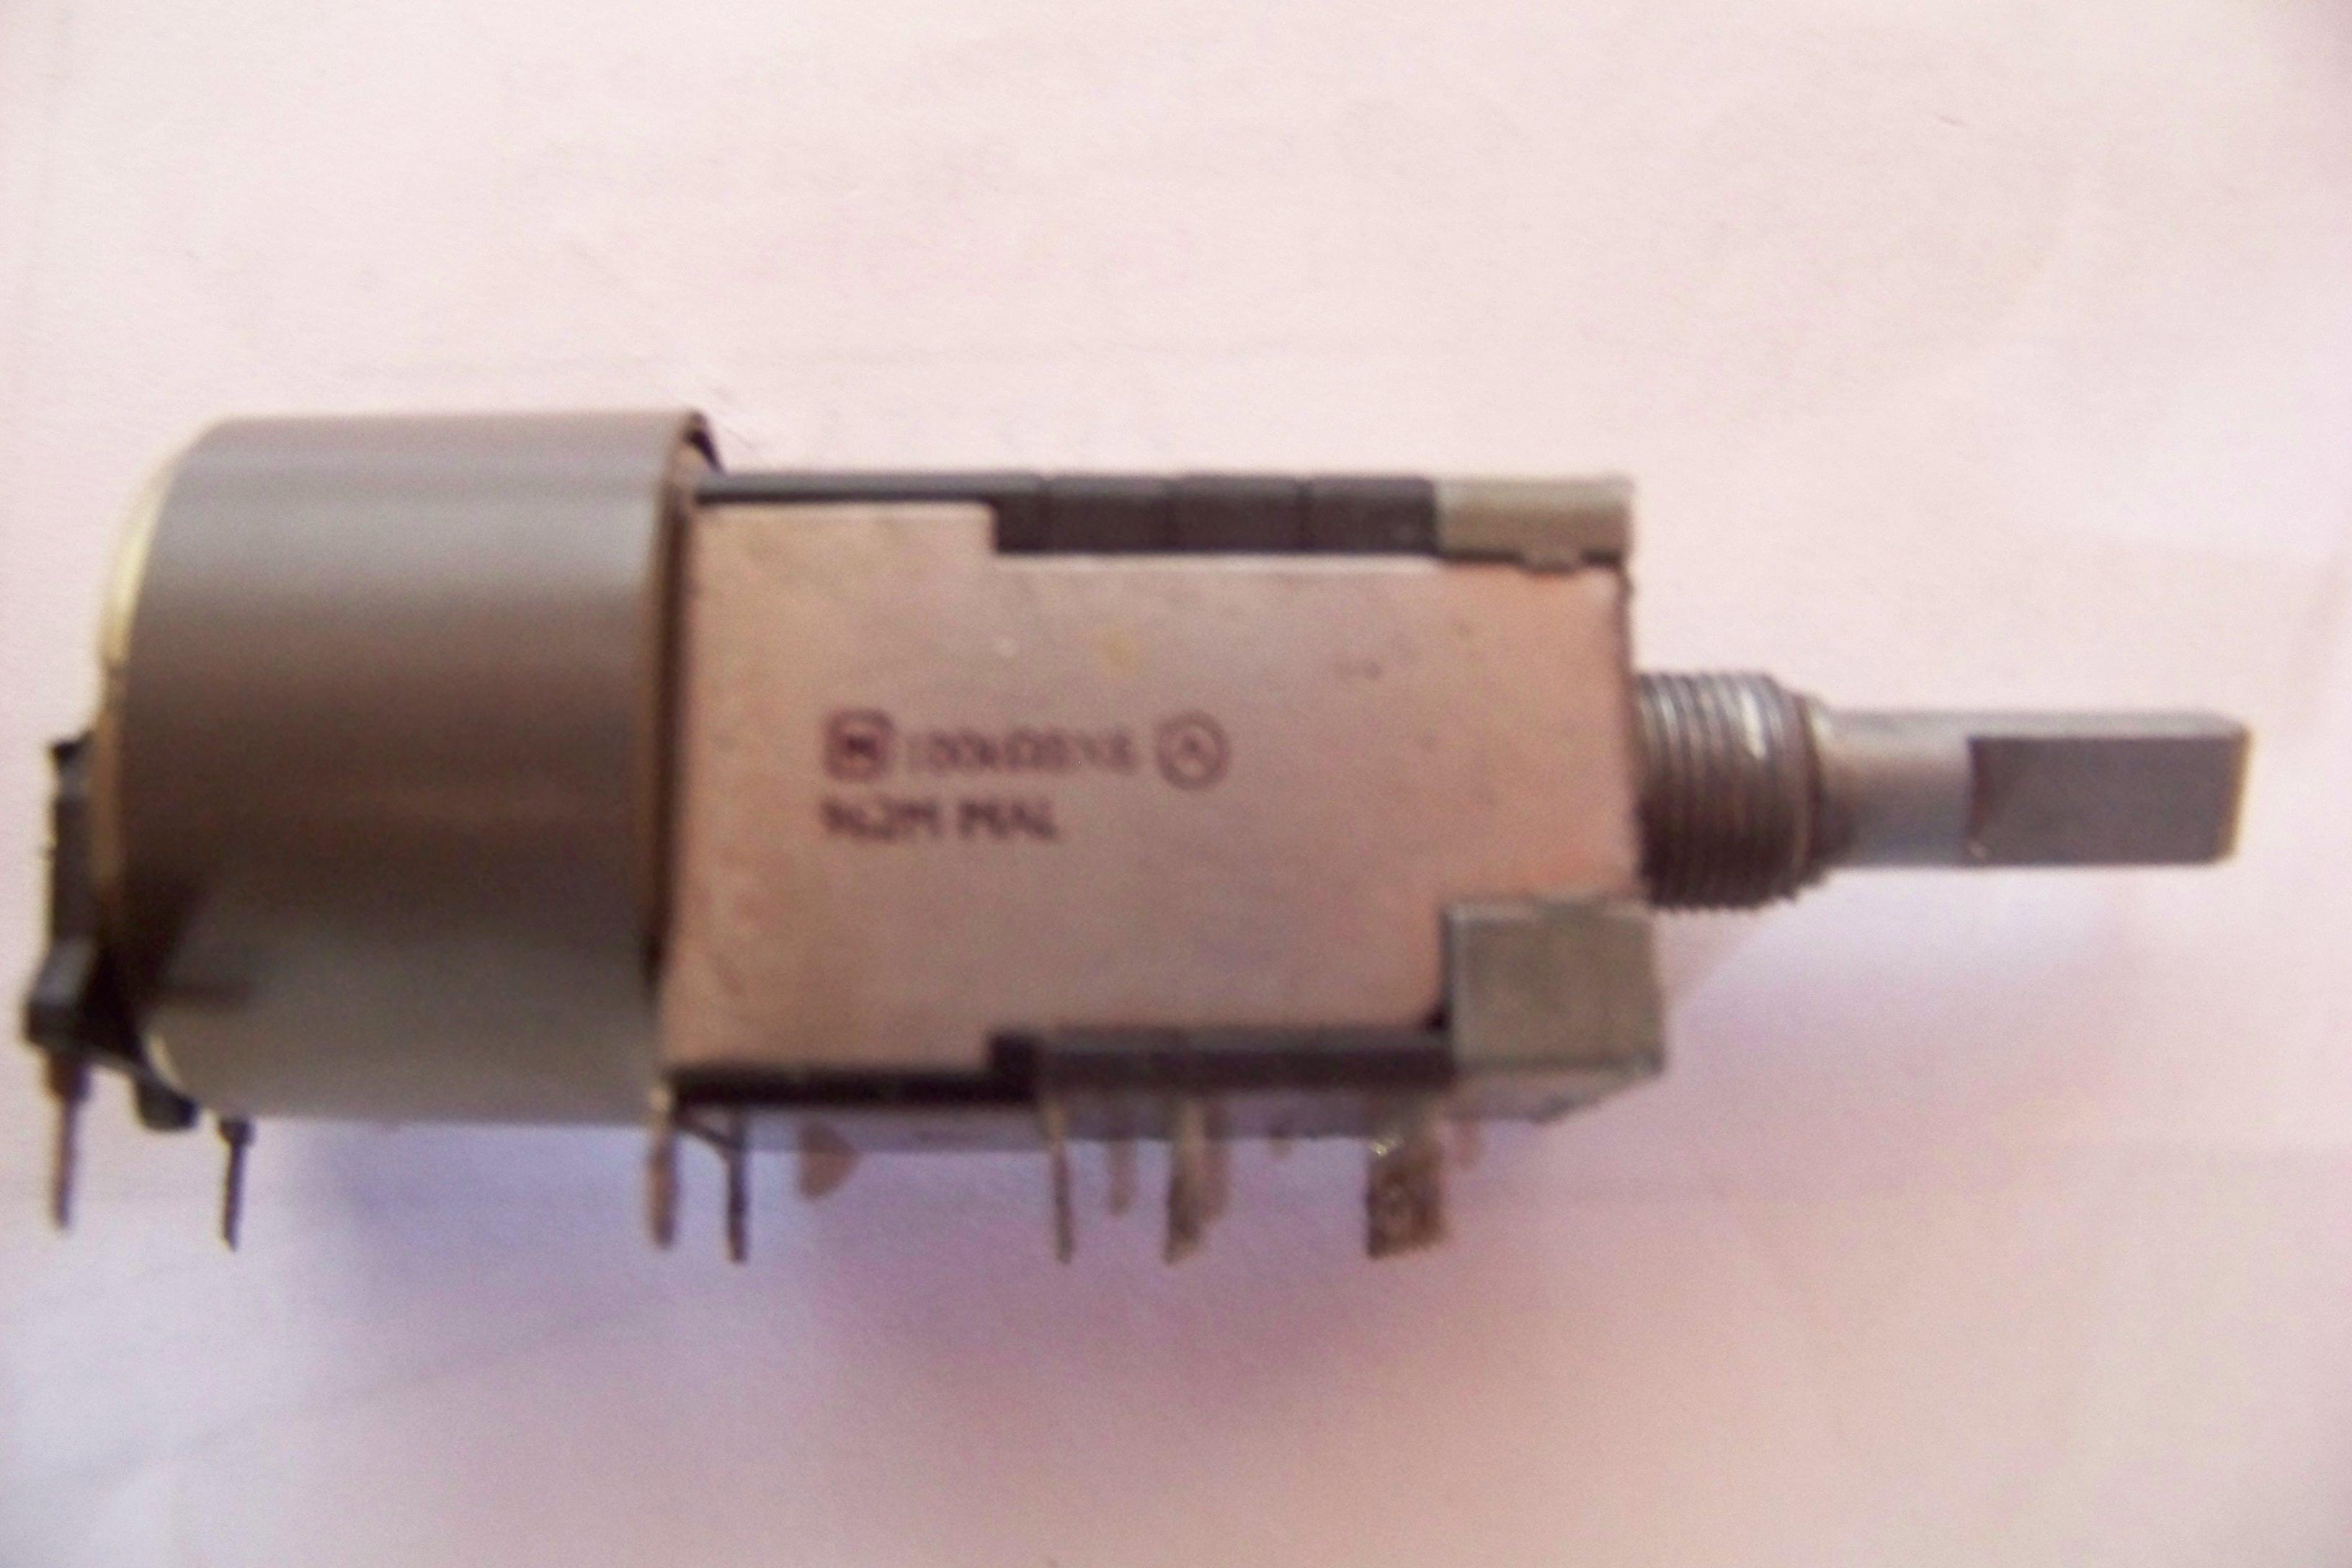 [Kupi�] Potencjometr EUWM6A026B15 100kOmBX6 od Technicsa SA-AX530/540/6/710